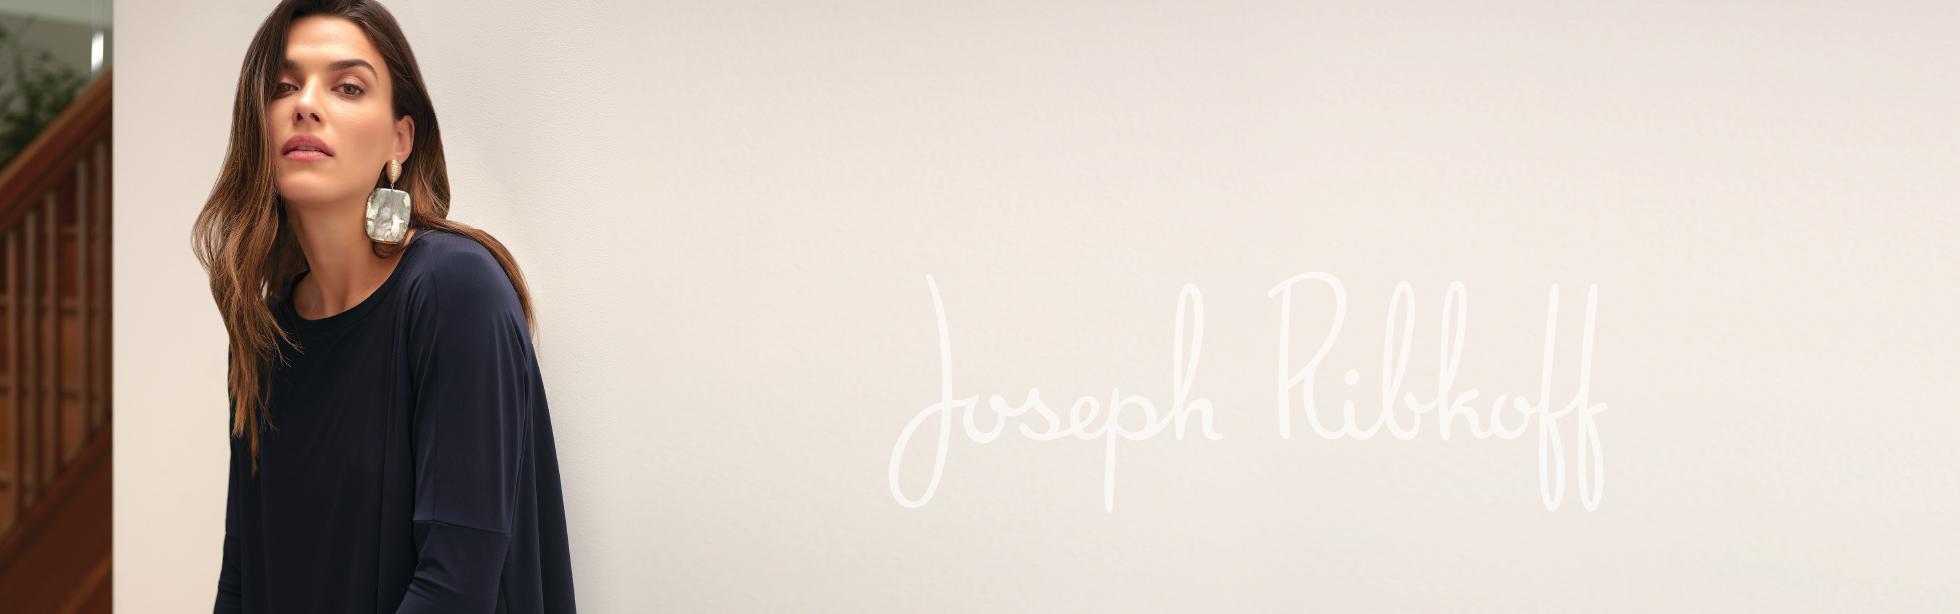 Header Joseph Ribkoff